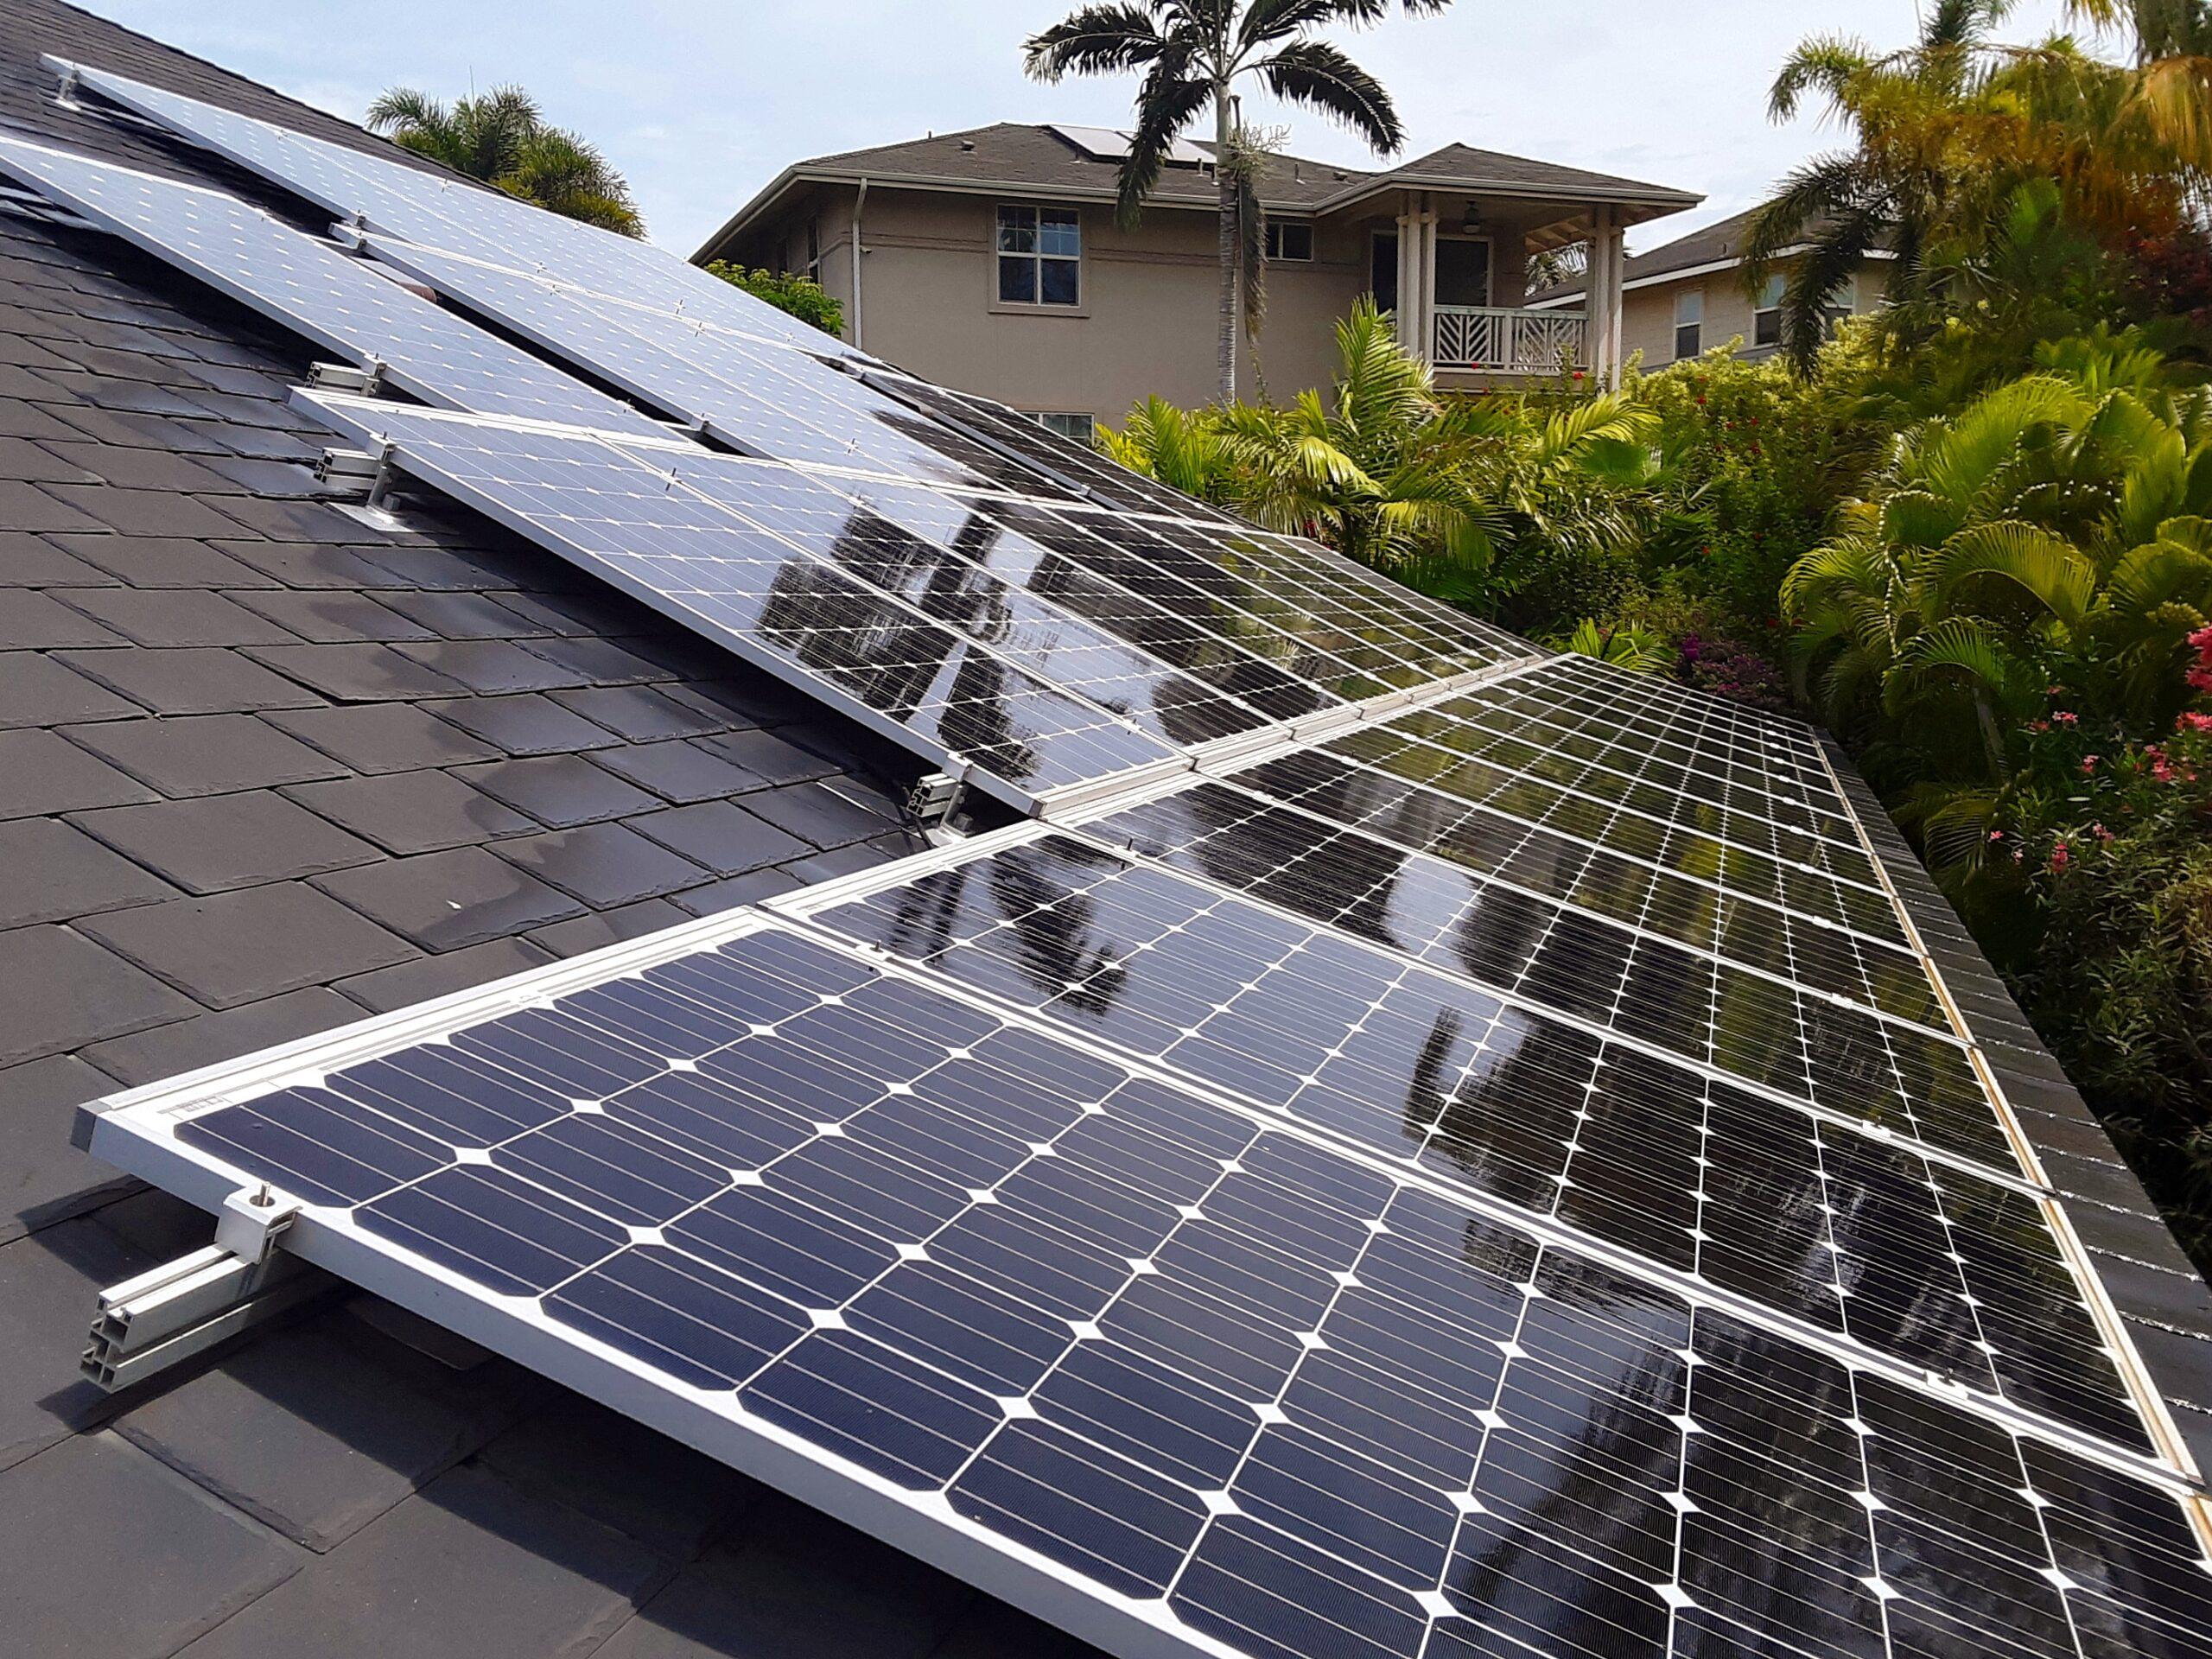 Kauai Solar Panel Cleaning Service